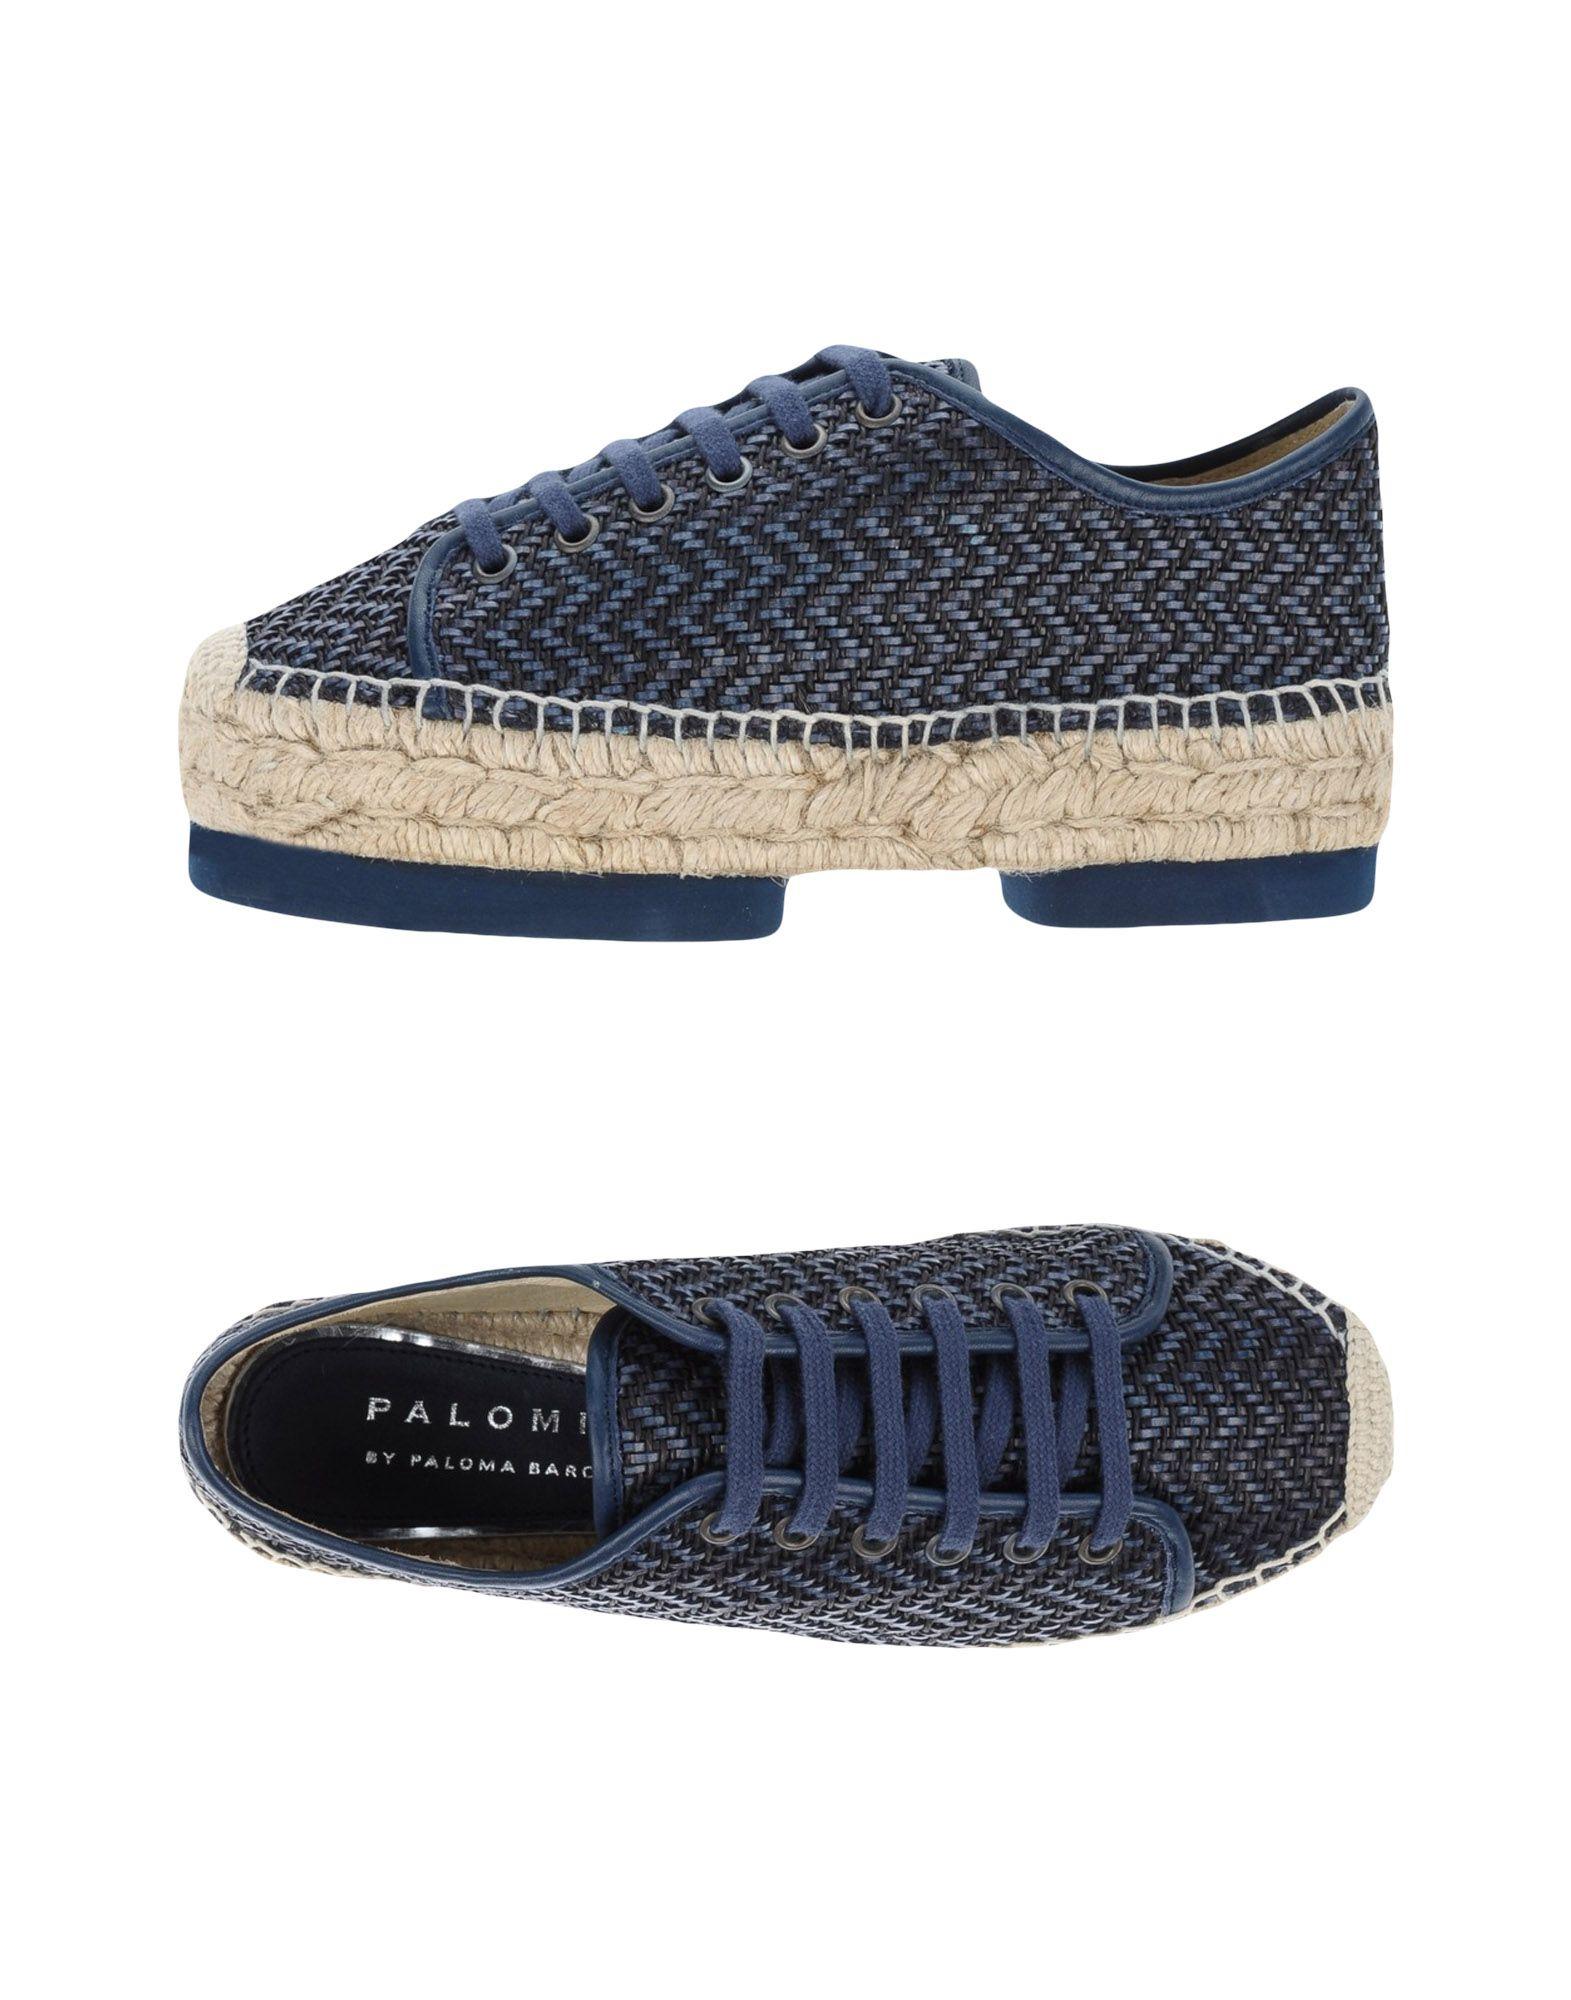 Palomitas By Paloma Barceló Schnürschuhe Damen  11293516KO Gute Qualität beliebte Schuhe